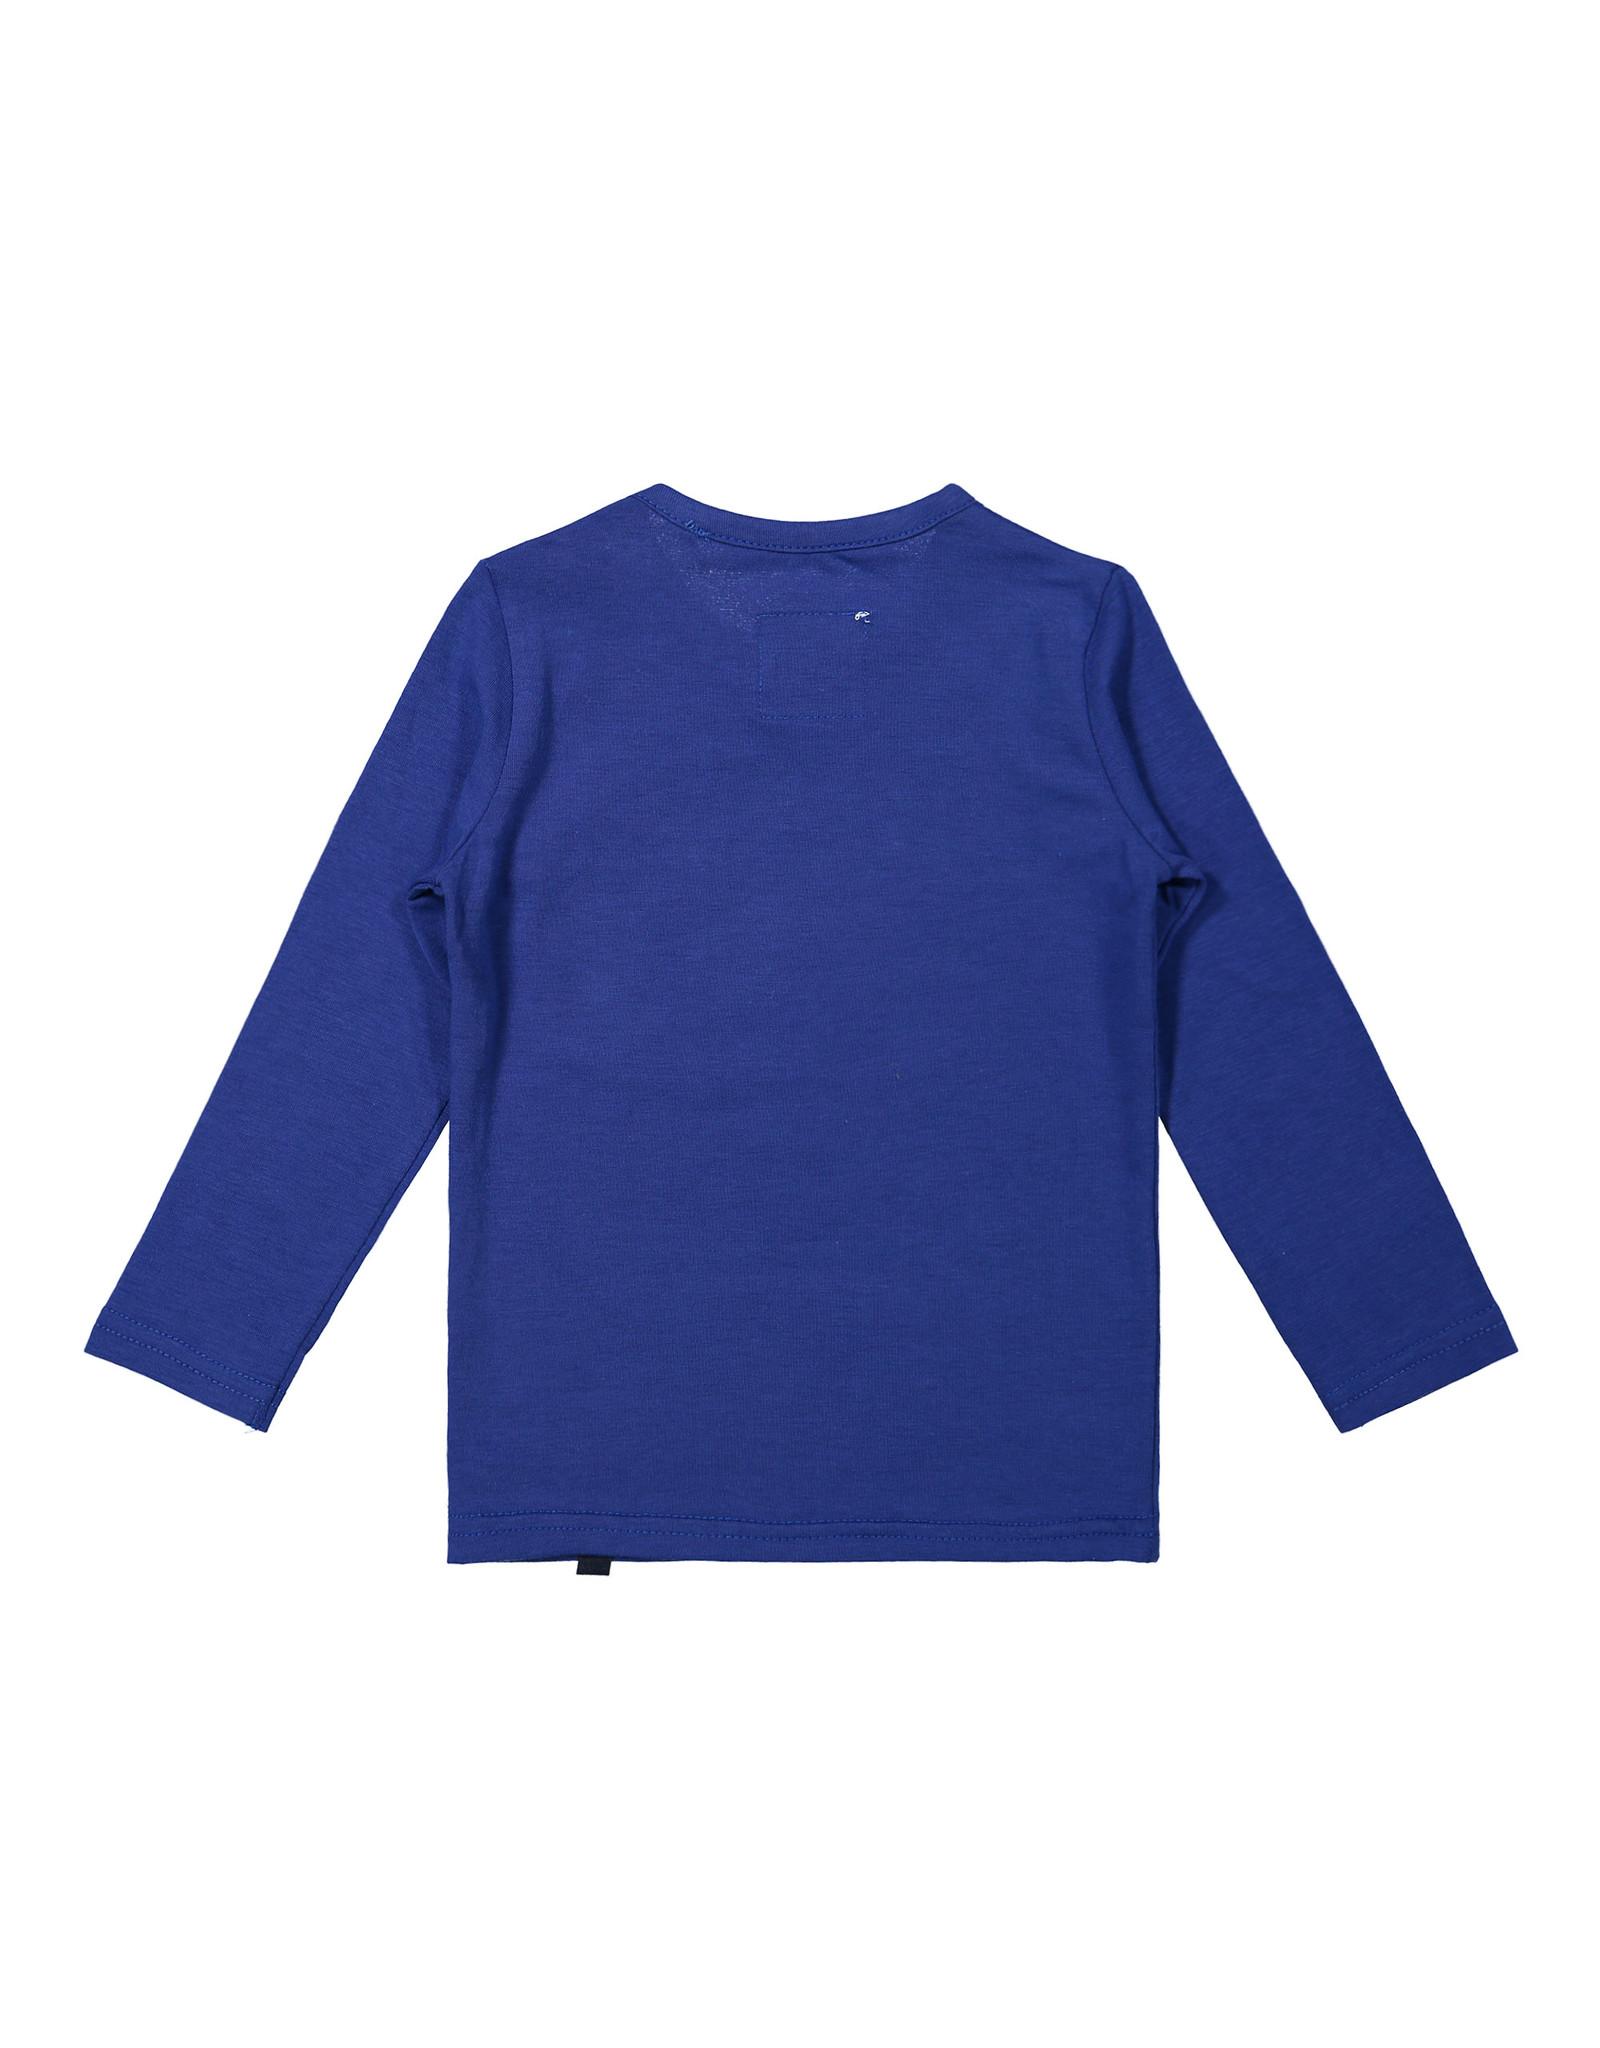 Koko Noko Koko Noko jongens shirt Don't Wake the Bear Blue